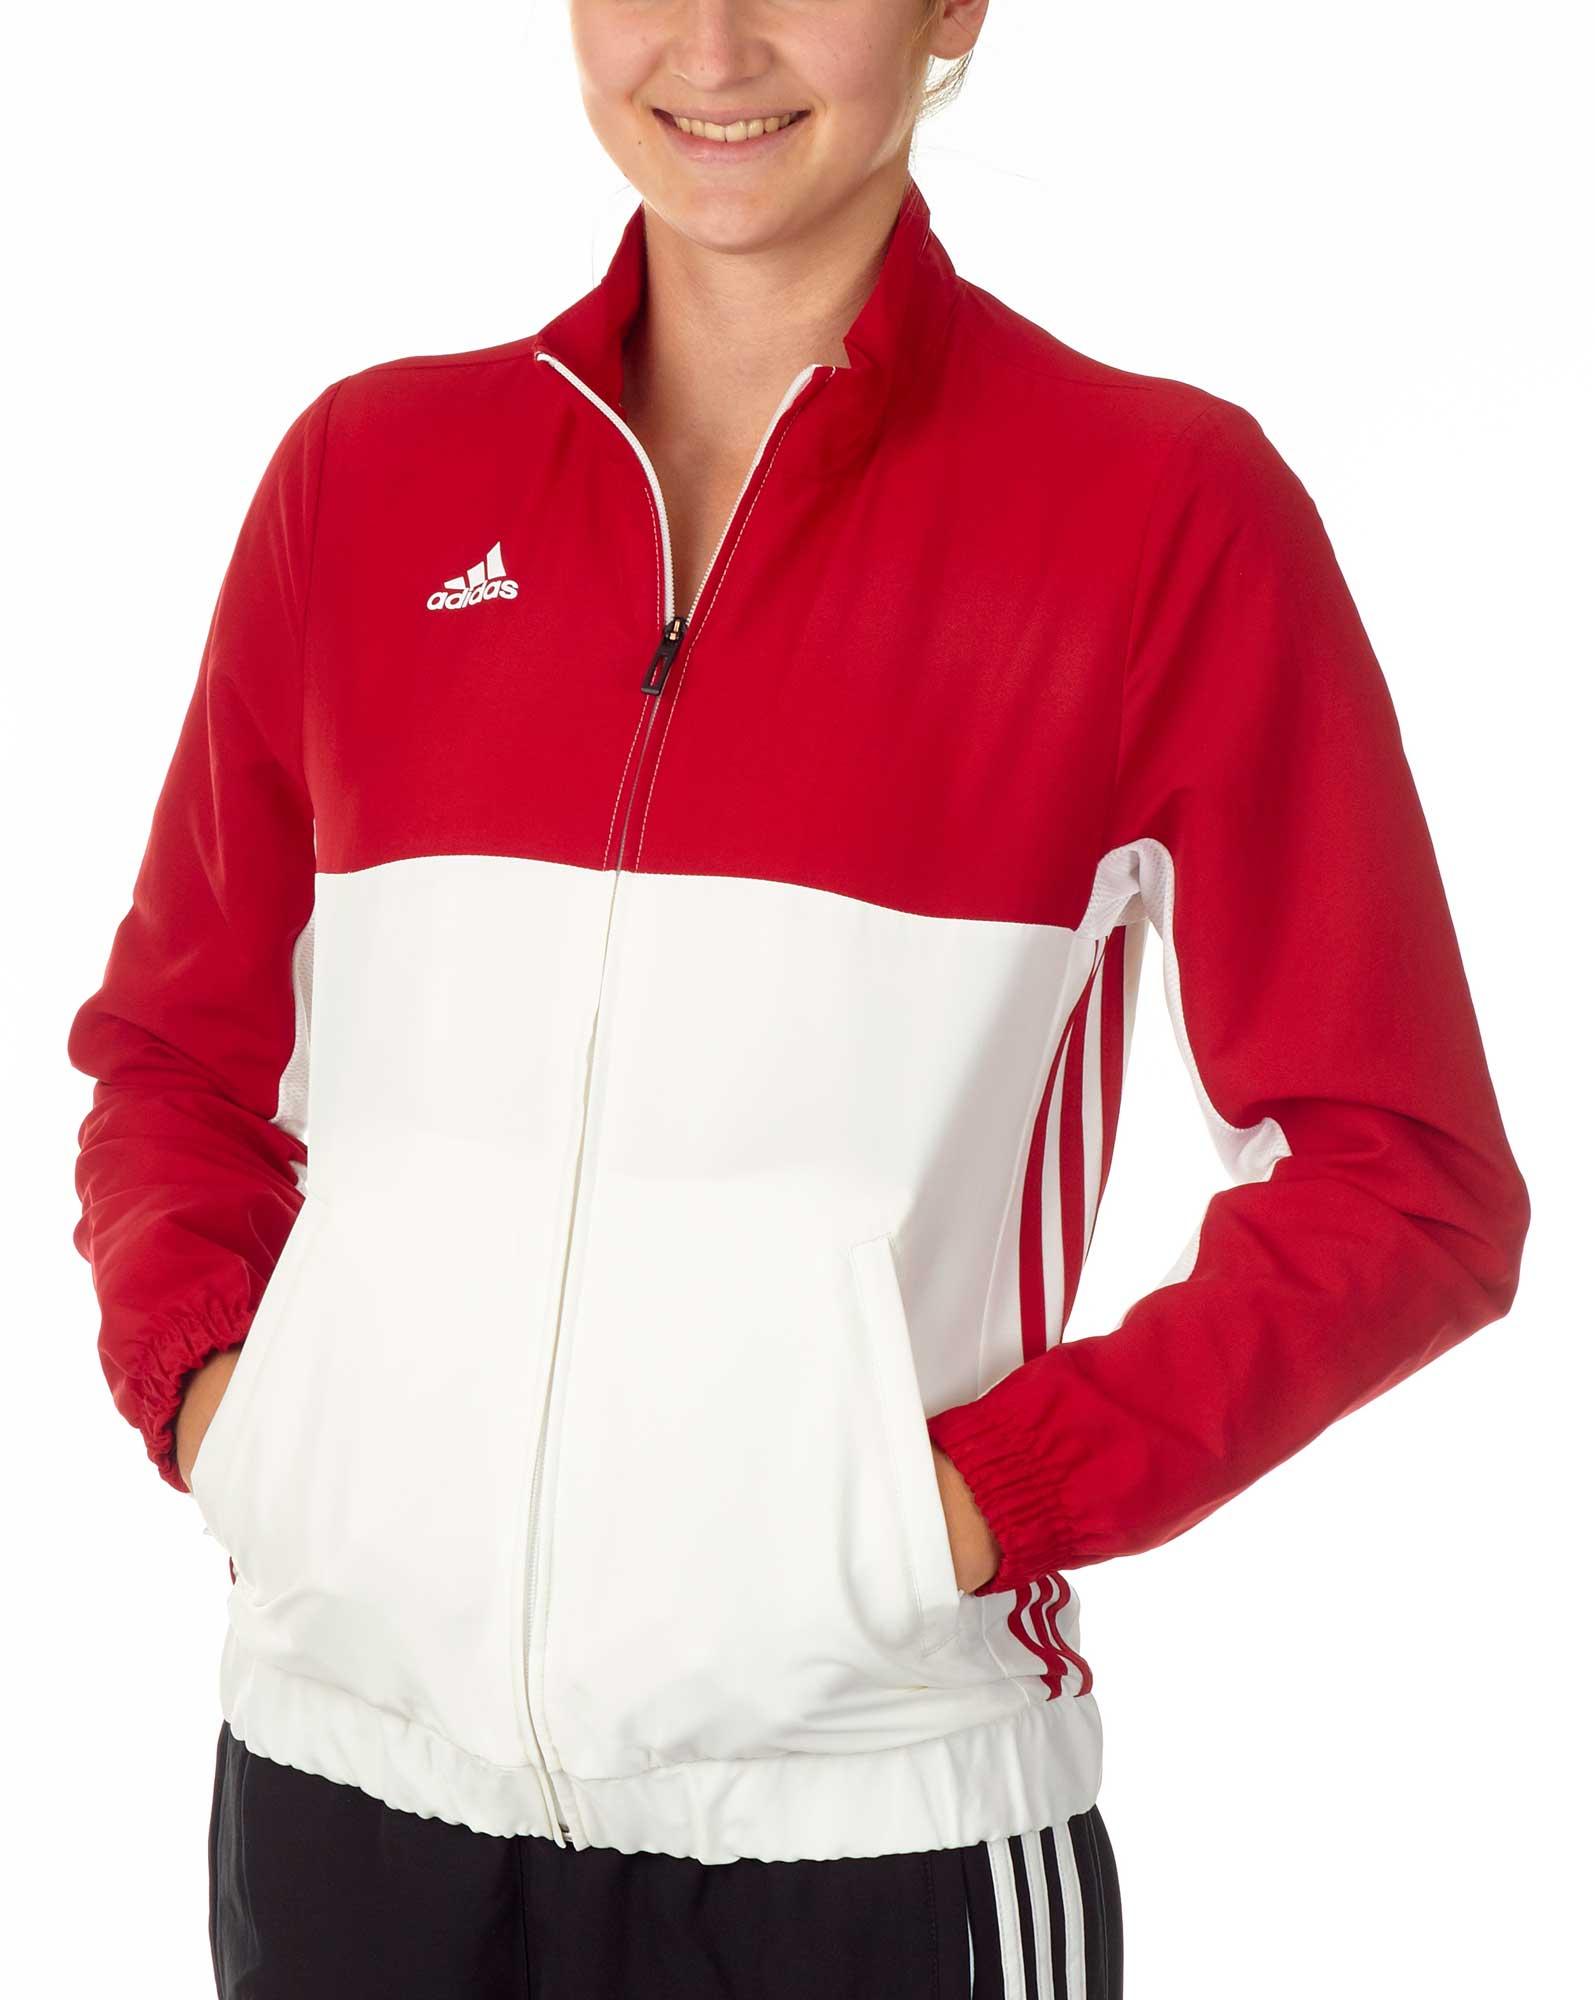 Hattinger Kampfsport Shop - adidas T16 Team Jacket Damen power rot ... 188c2bf4b7